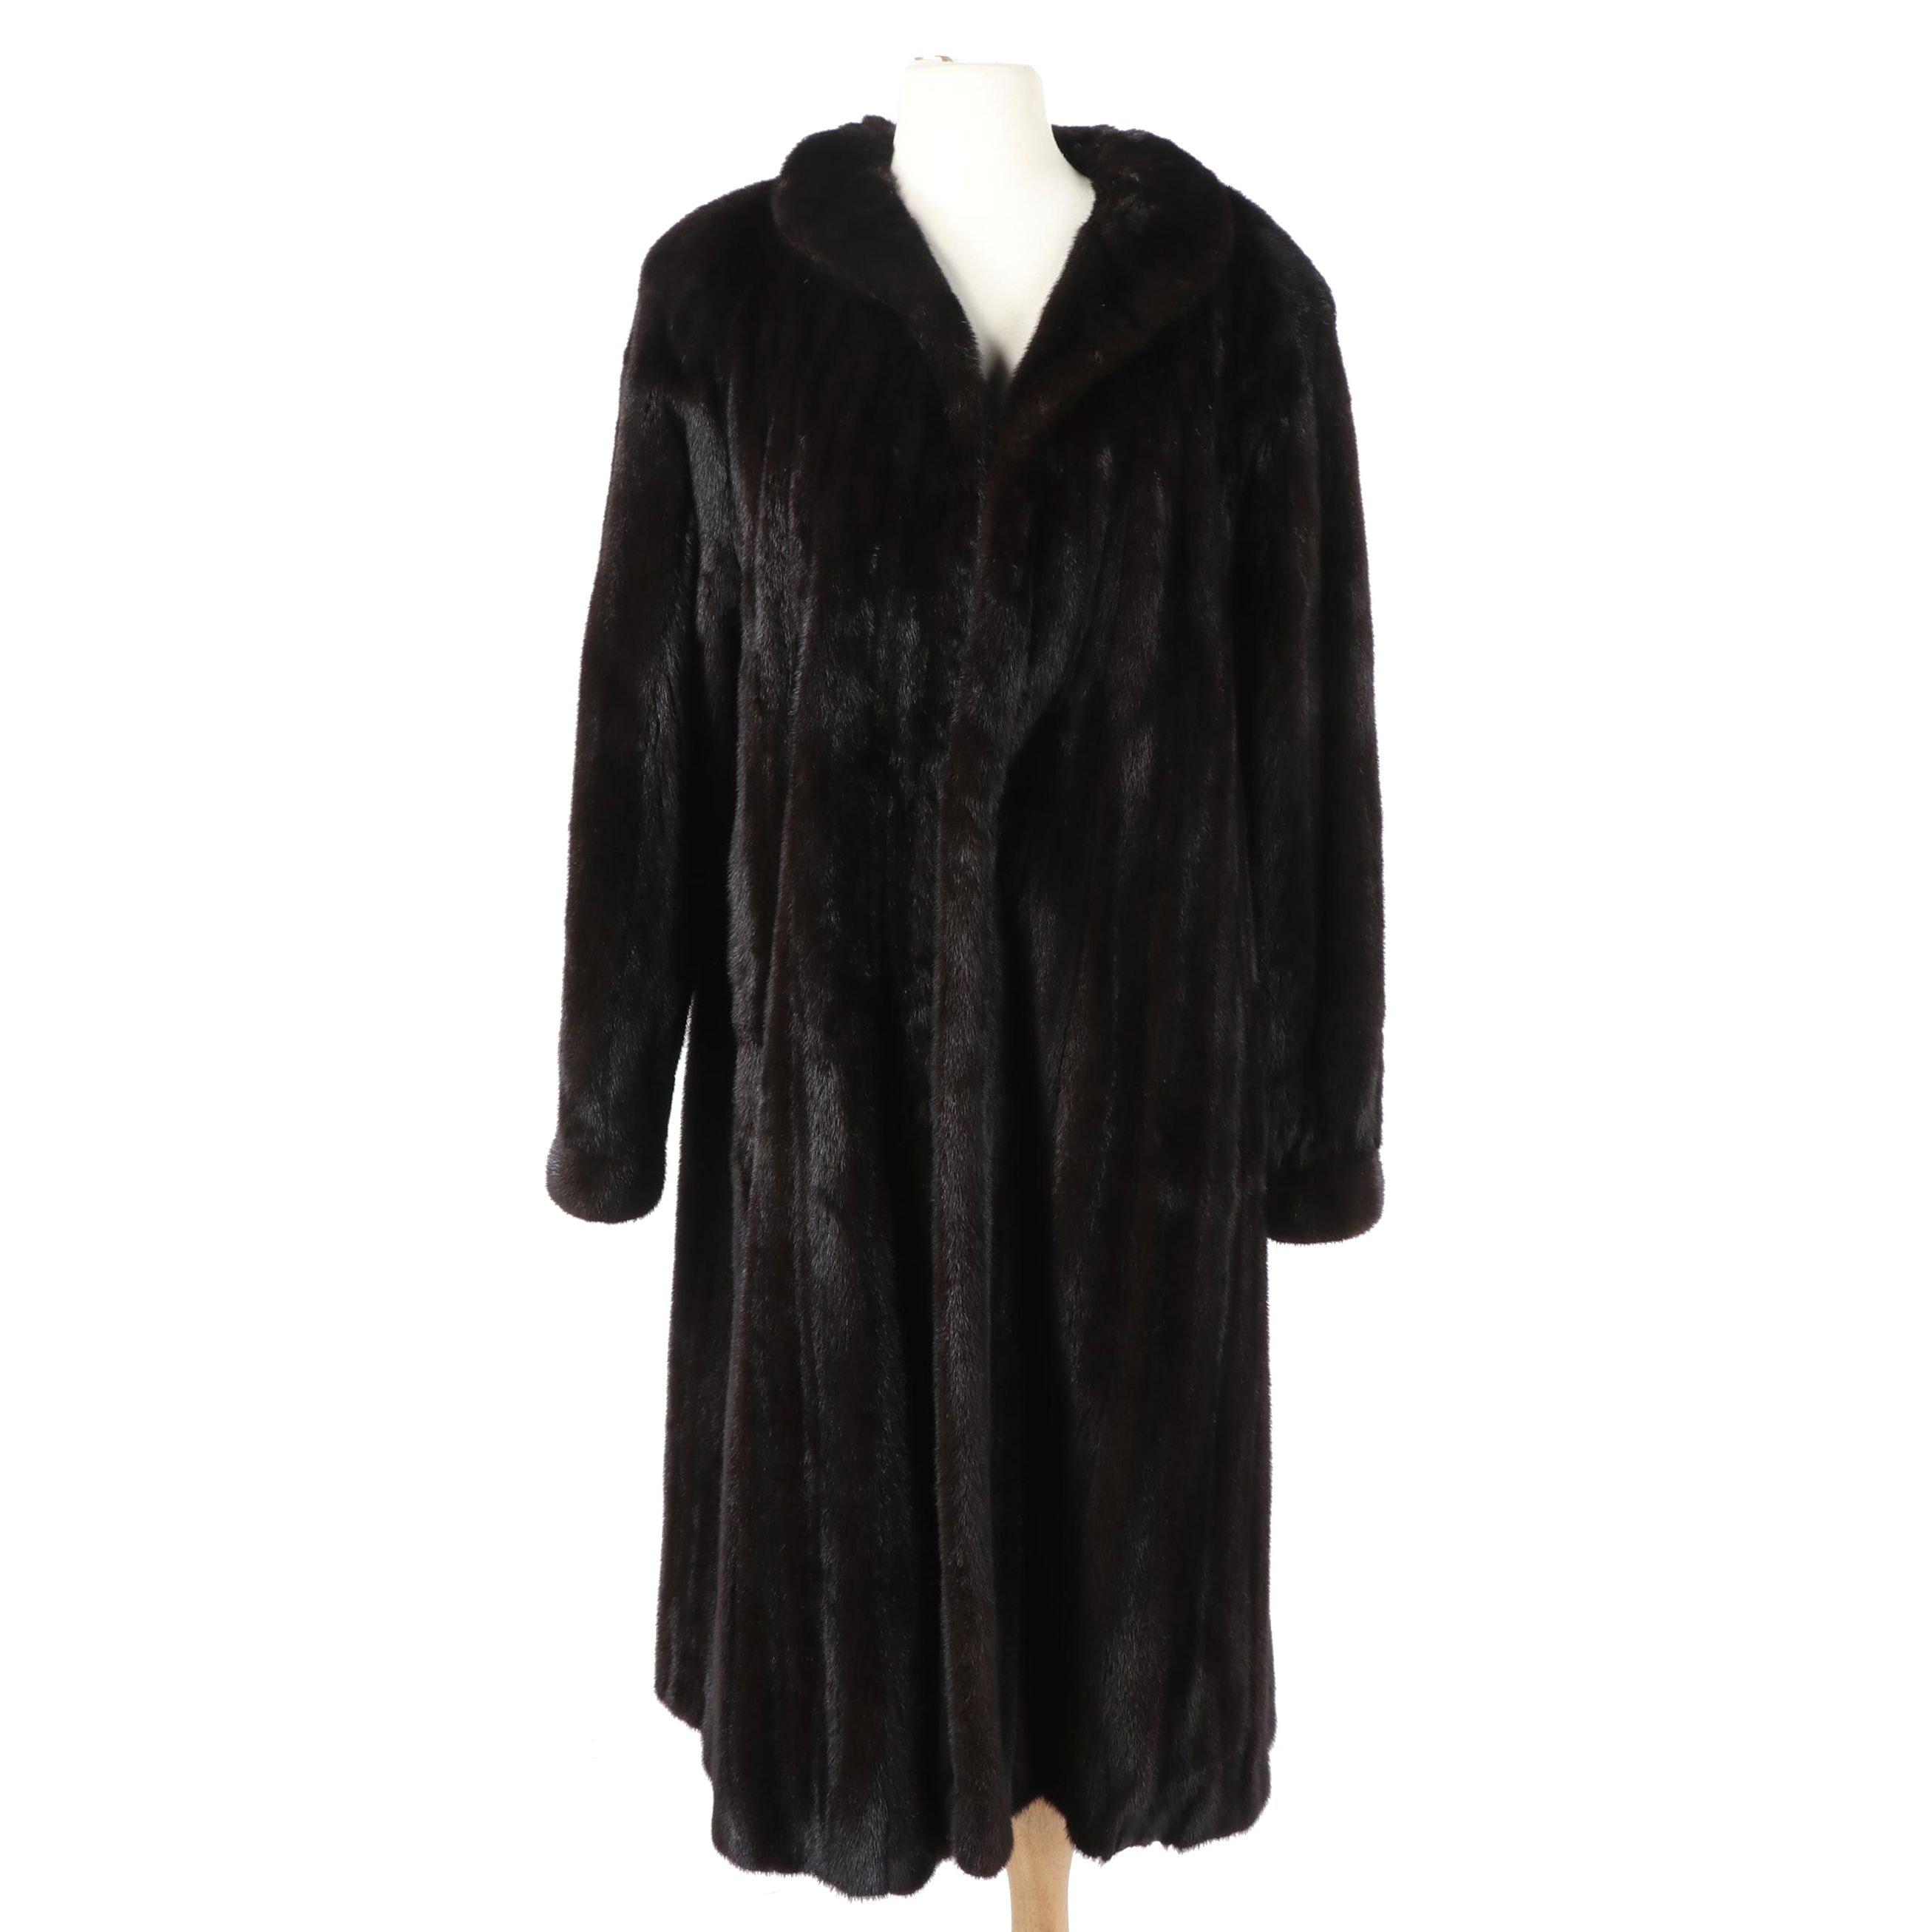 Natural Ranch Mink Fur Coat from Bifano's of Dallas